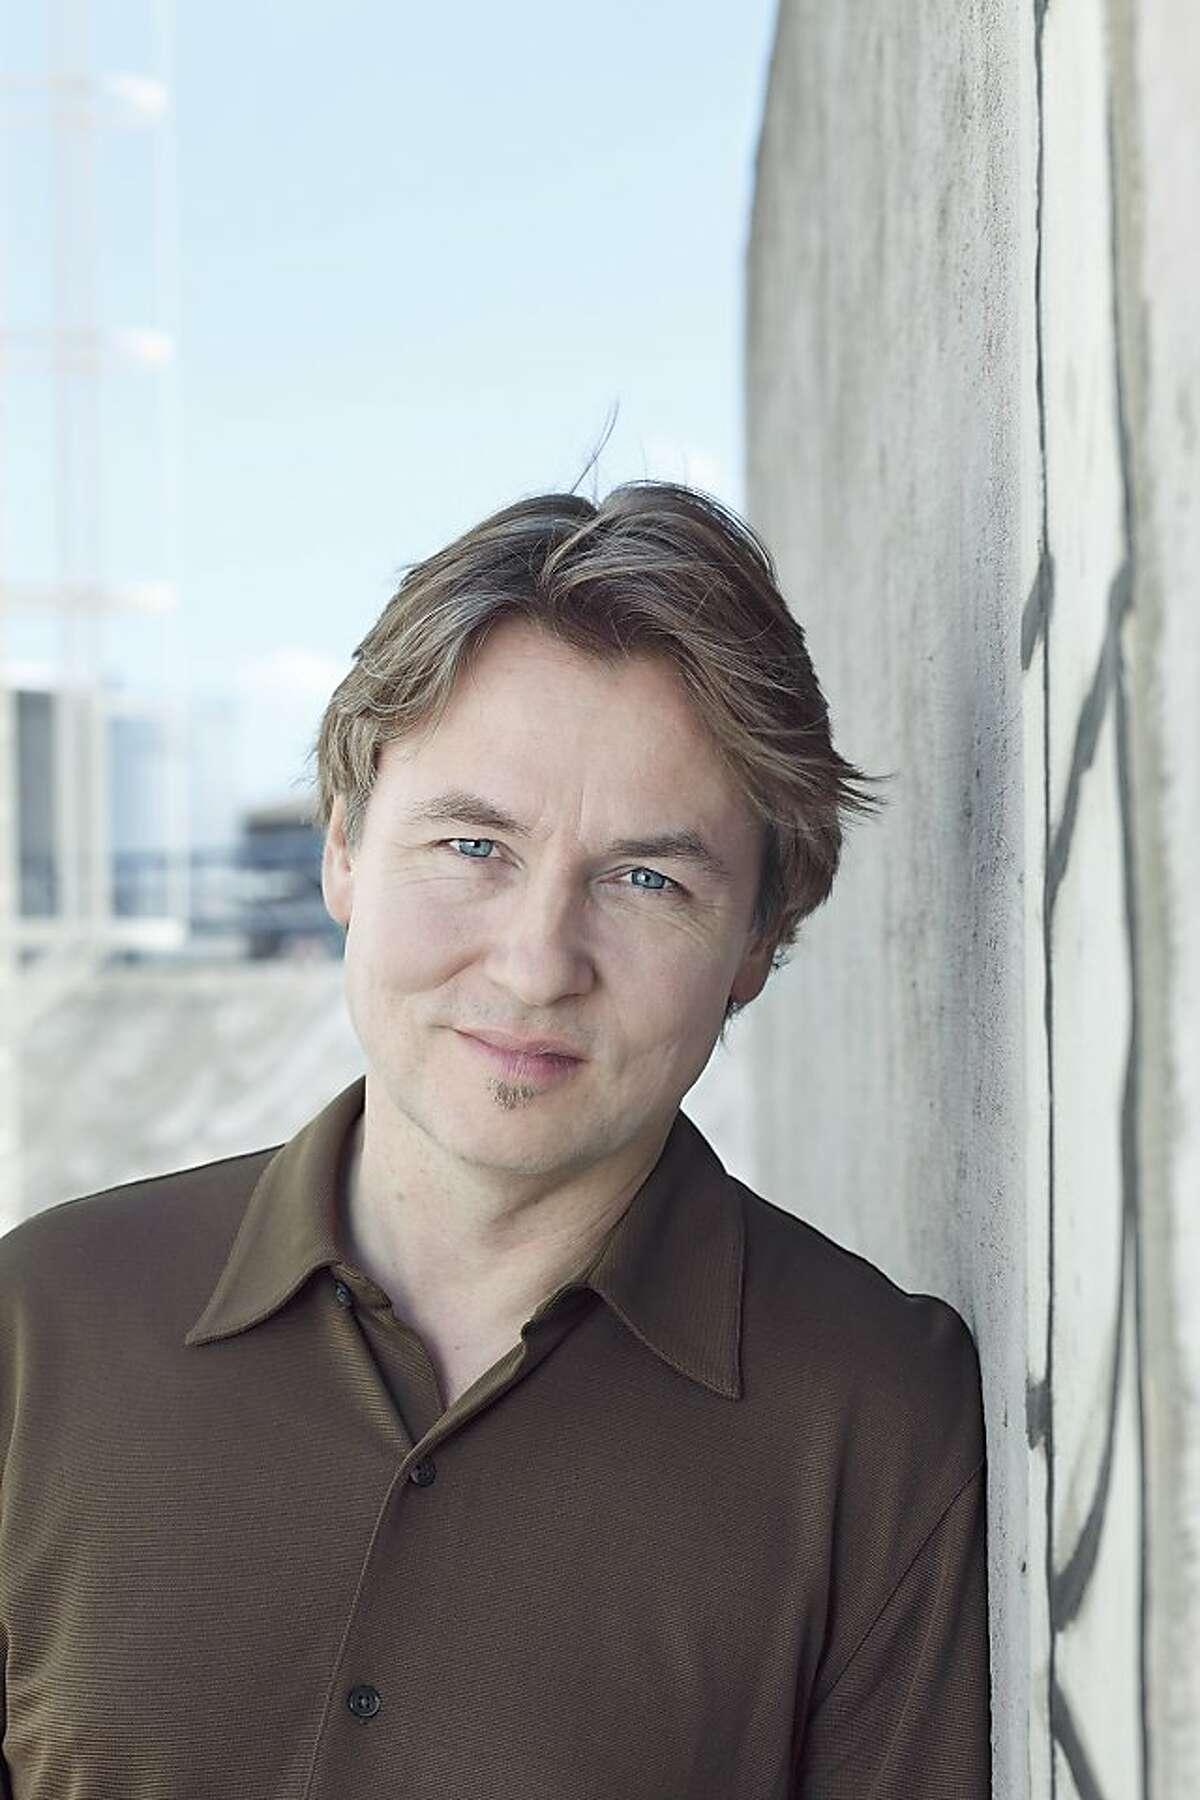 Composer and conductor Esa-Pekka Salonen